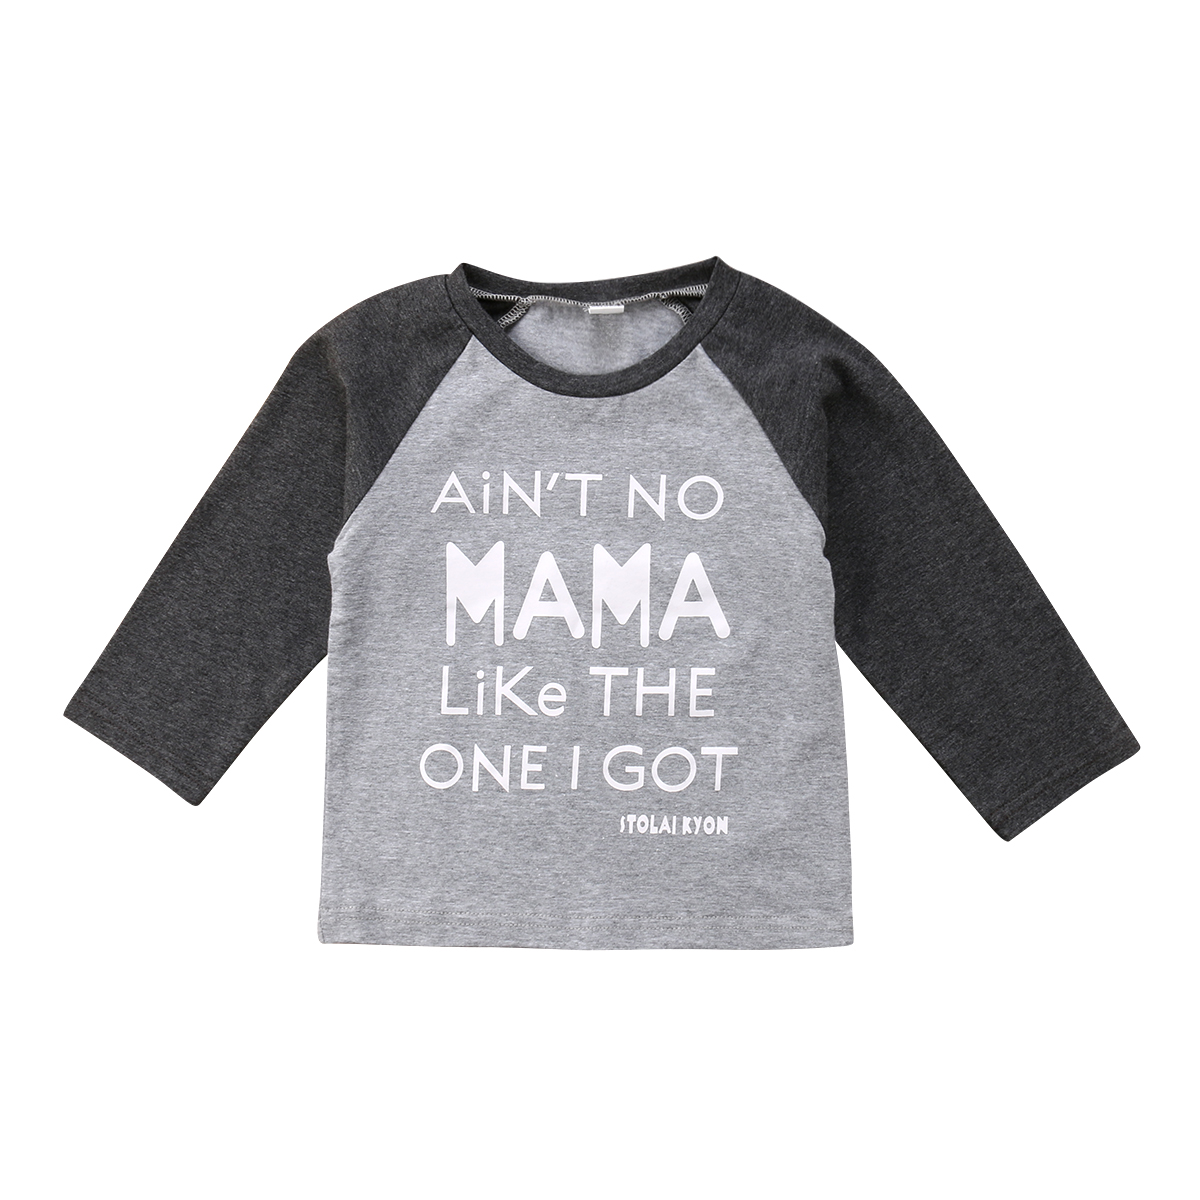 ba4ea87d7bd Toddler Kid Boy Long Sleeve Graphic Tees Baby Boy T shirt-in T ...